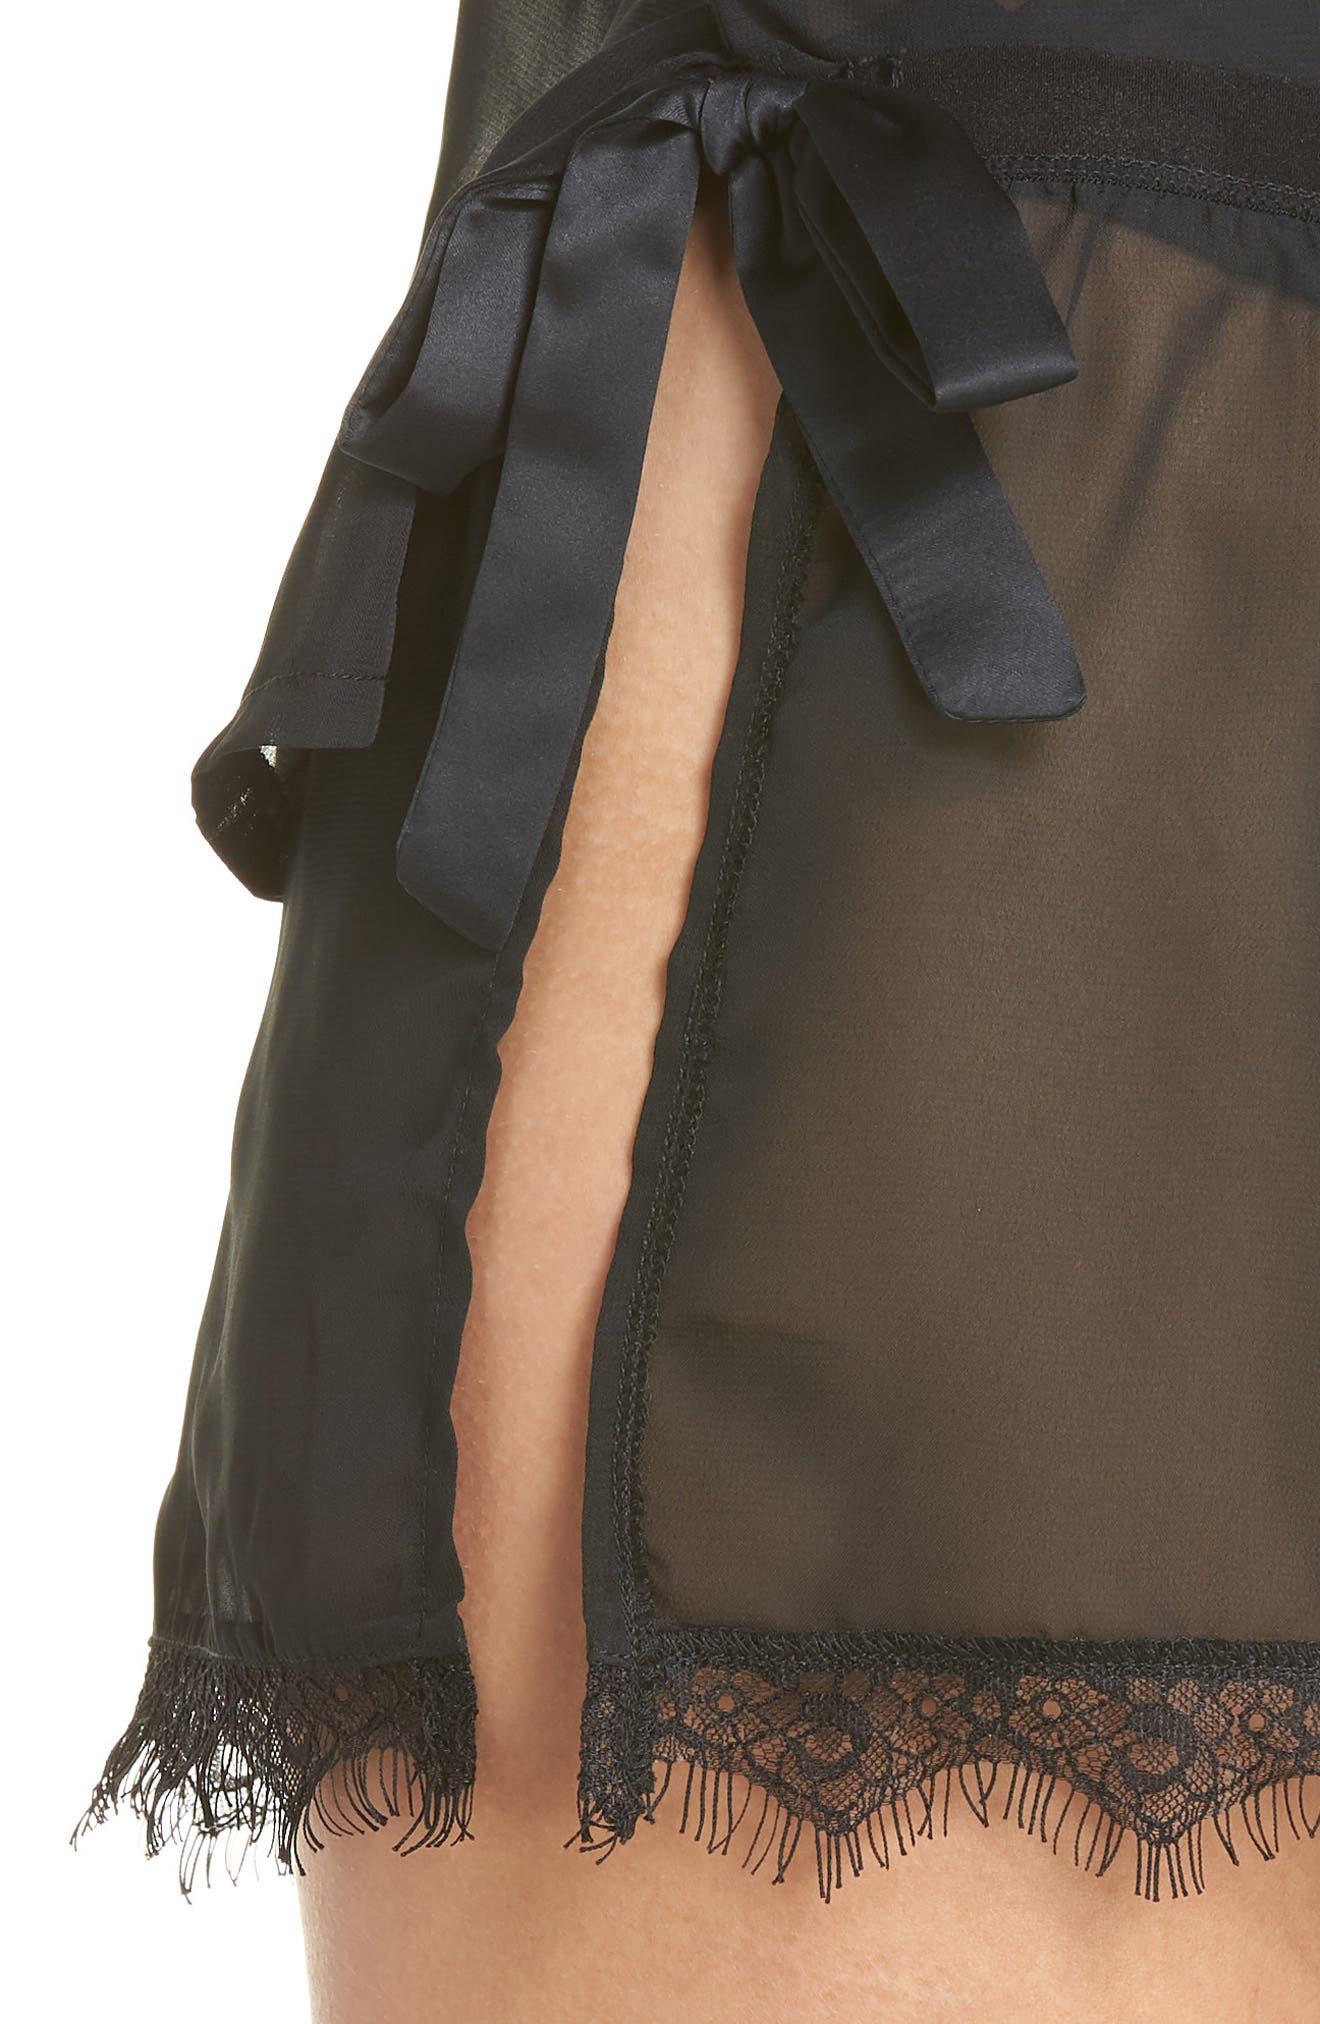 Copper Sheer Short Pajamas,                             Alternate thumbnail 4, color,                             BLACK